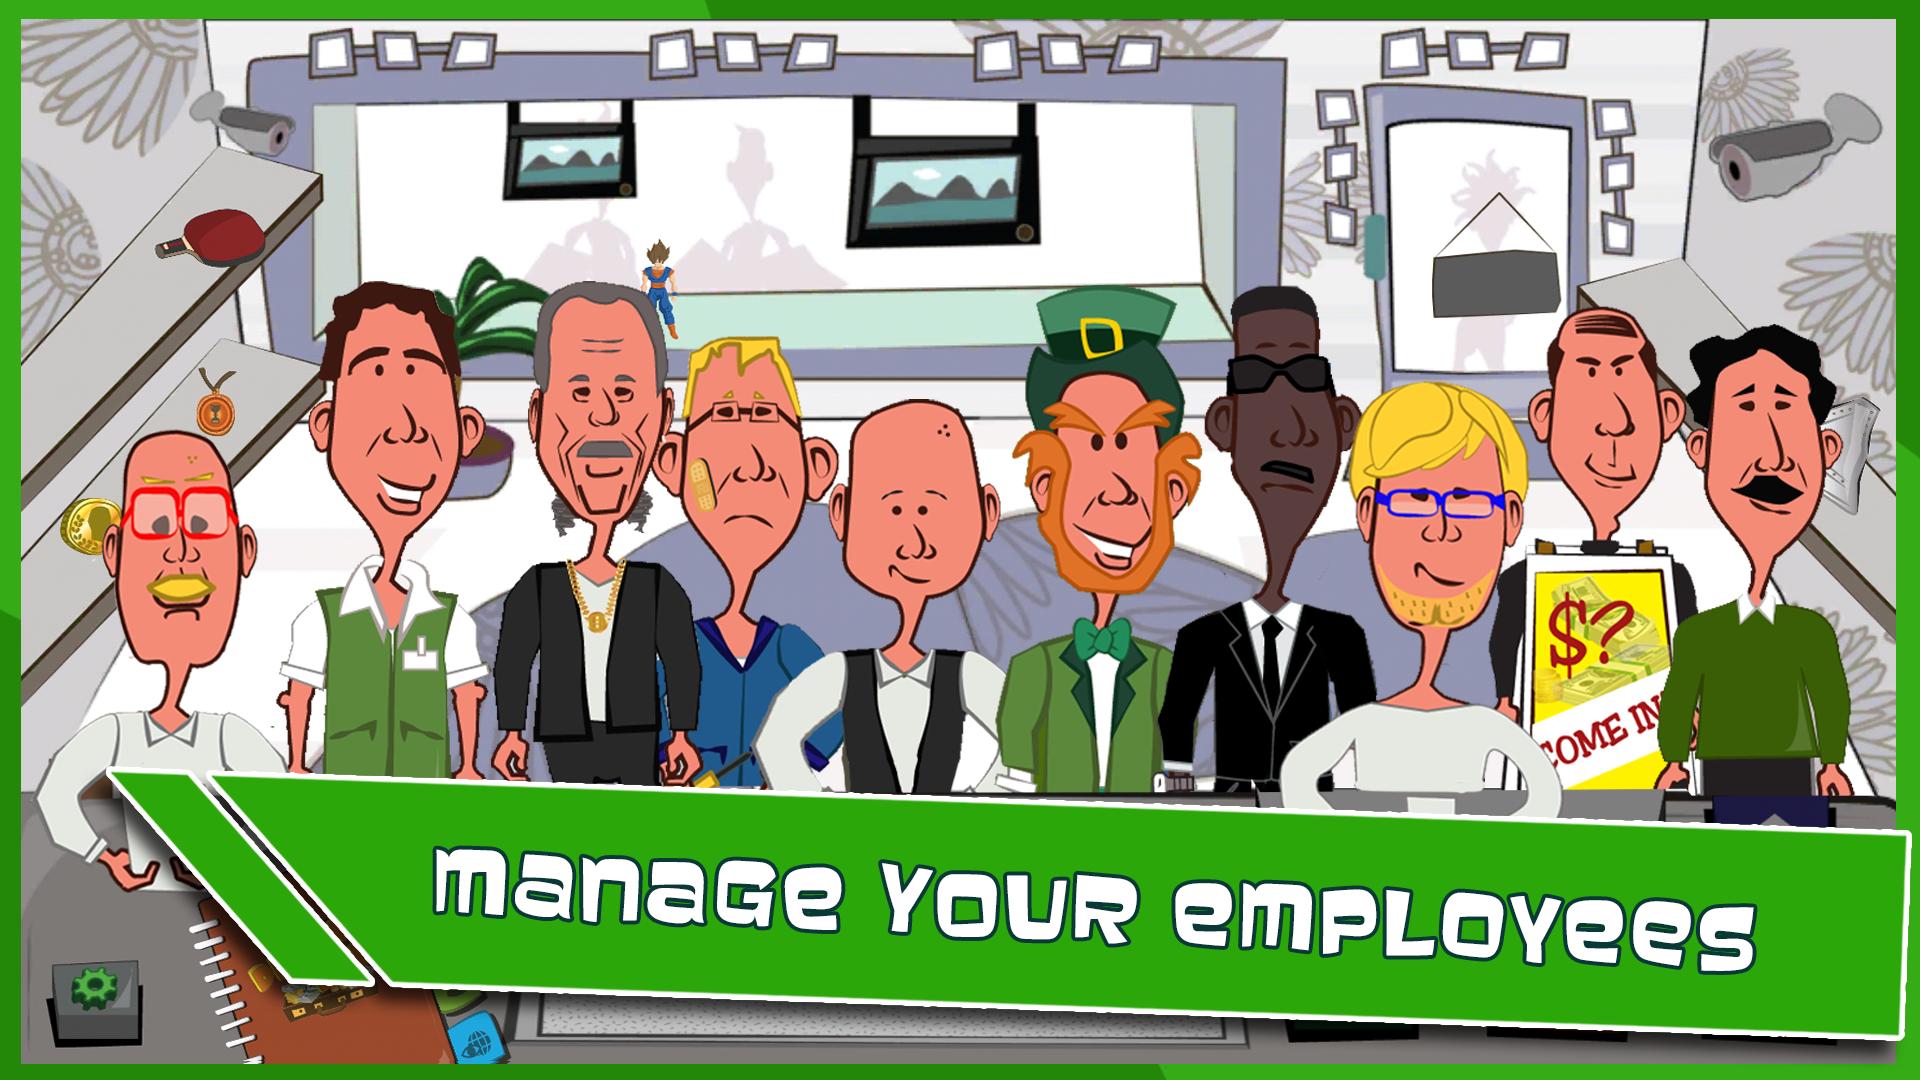 4_employees_en.png